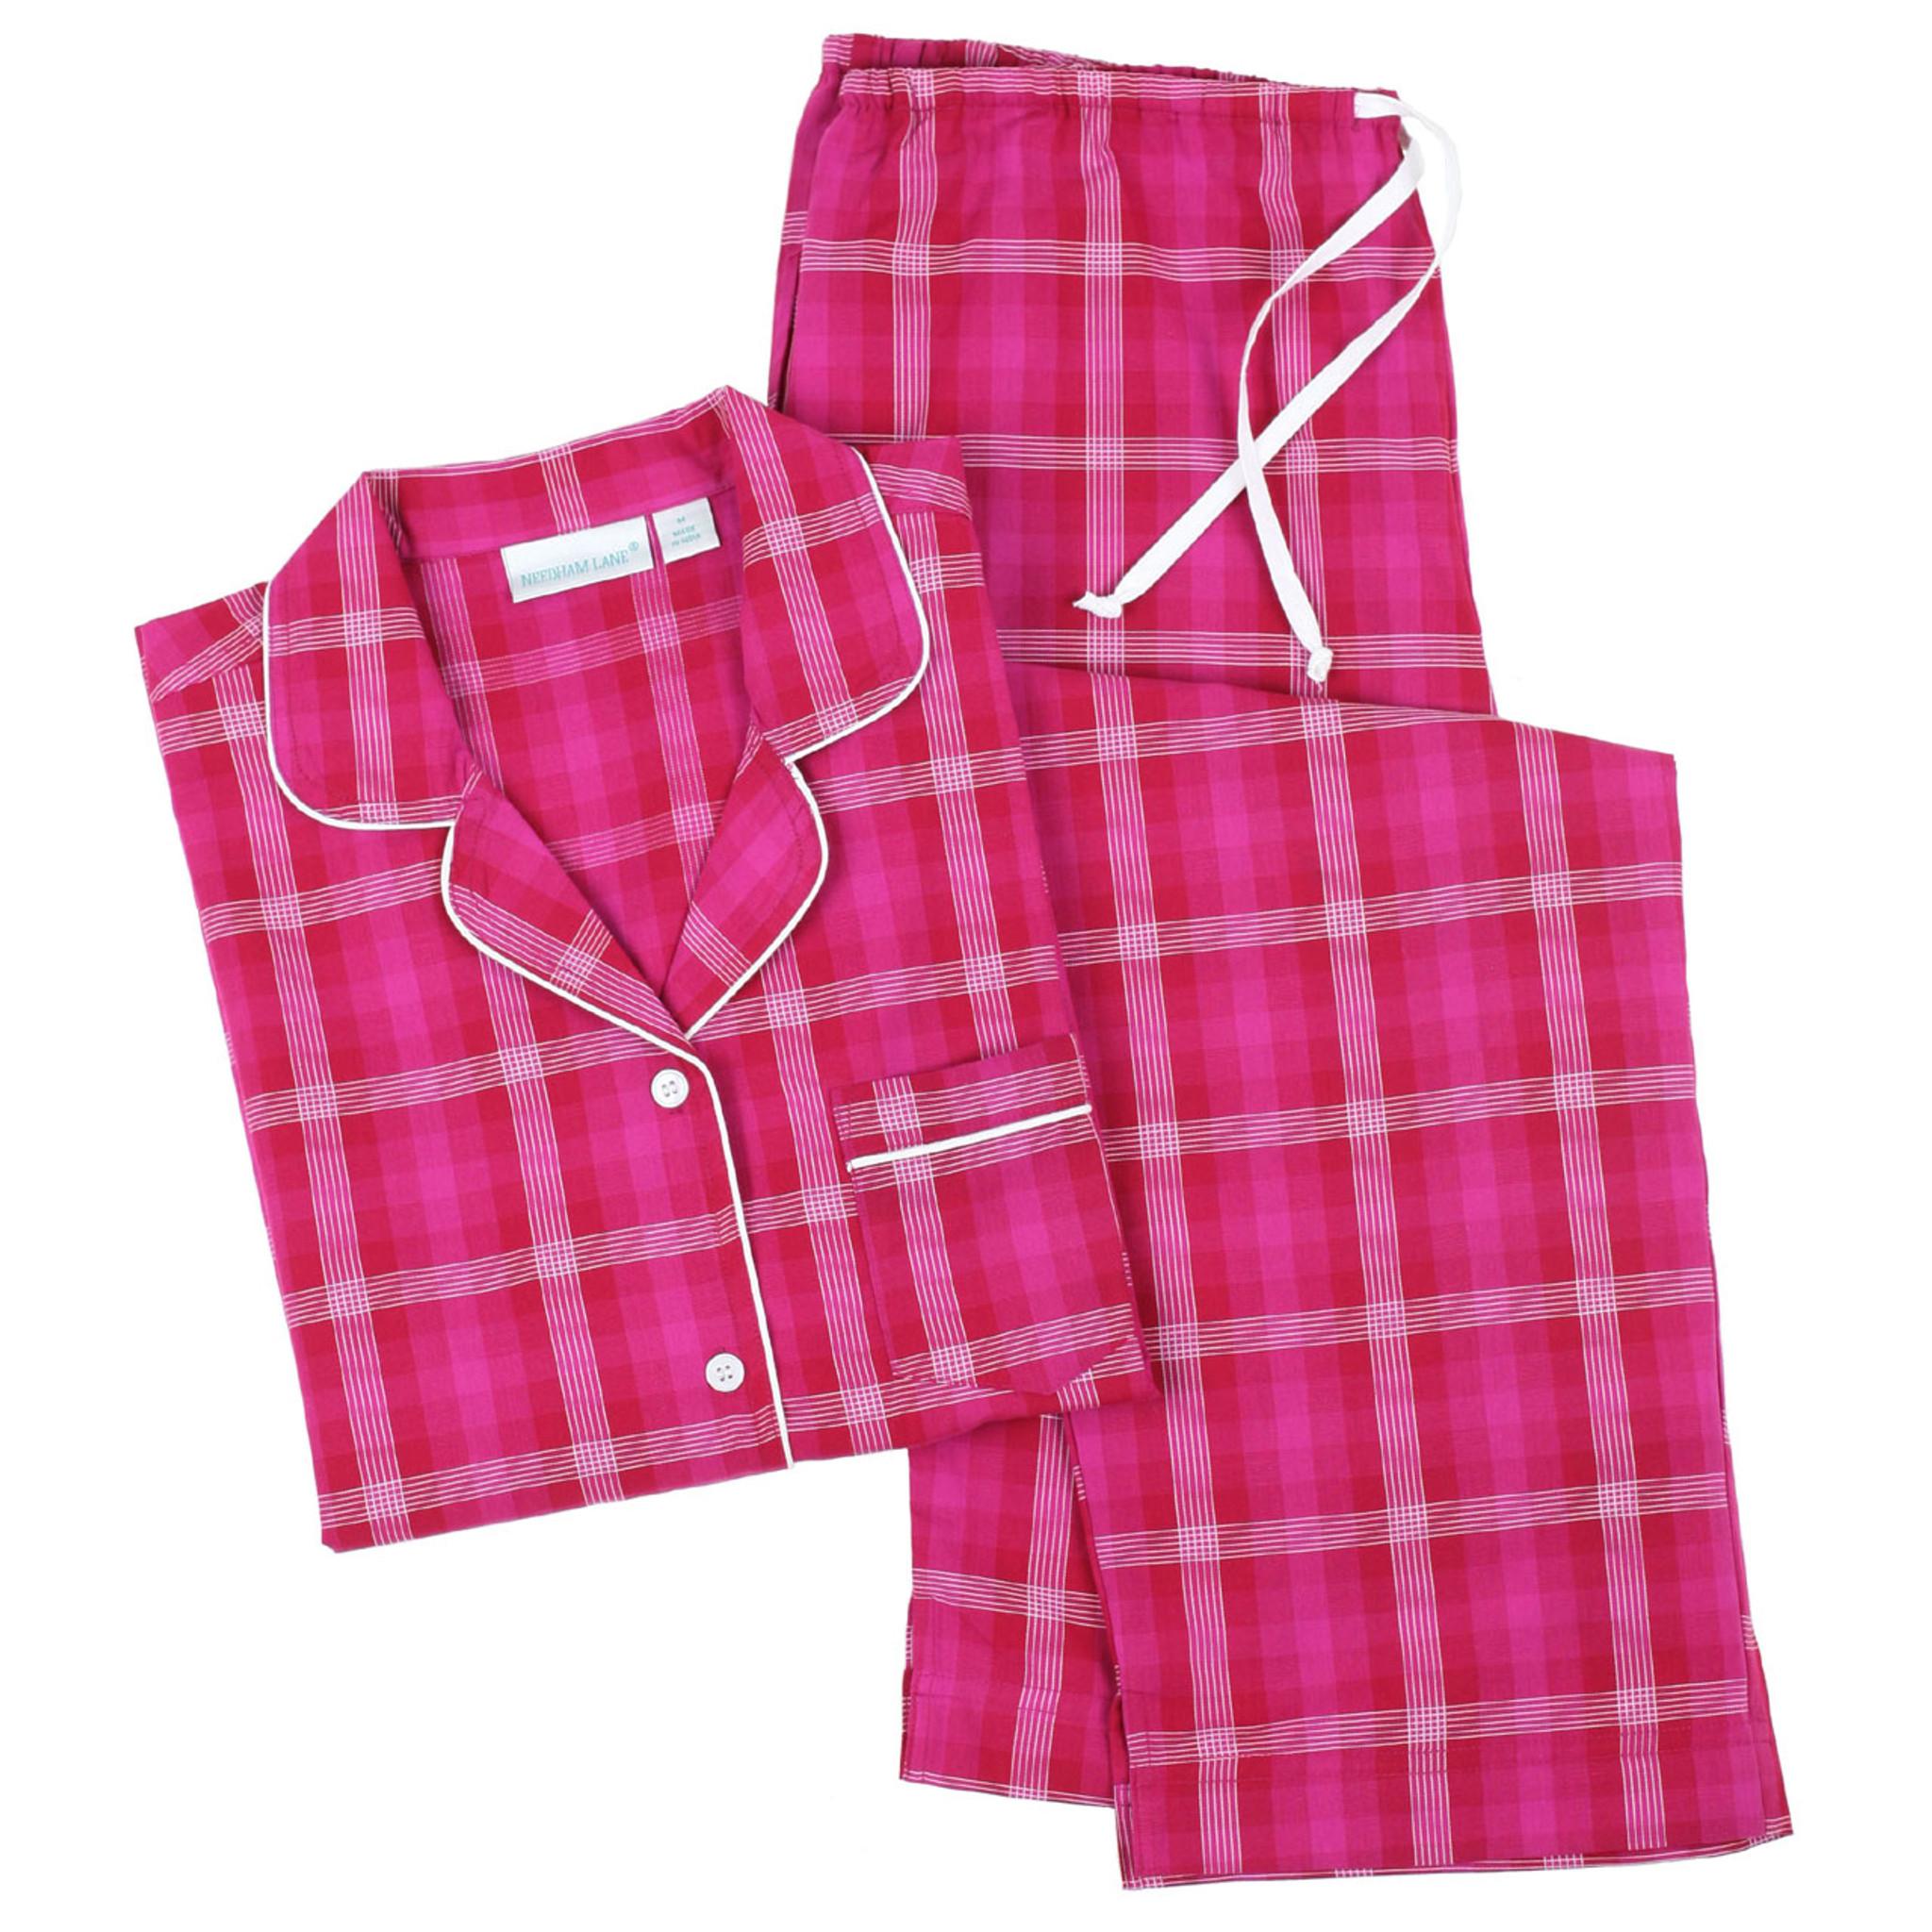 Kinsey ~ Cotton Classic Long Sleeve Pajamas - Needham Lane Ltd.